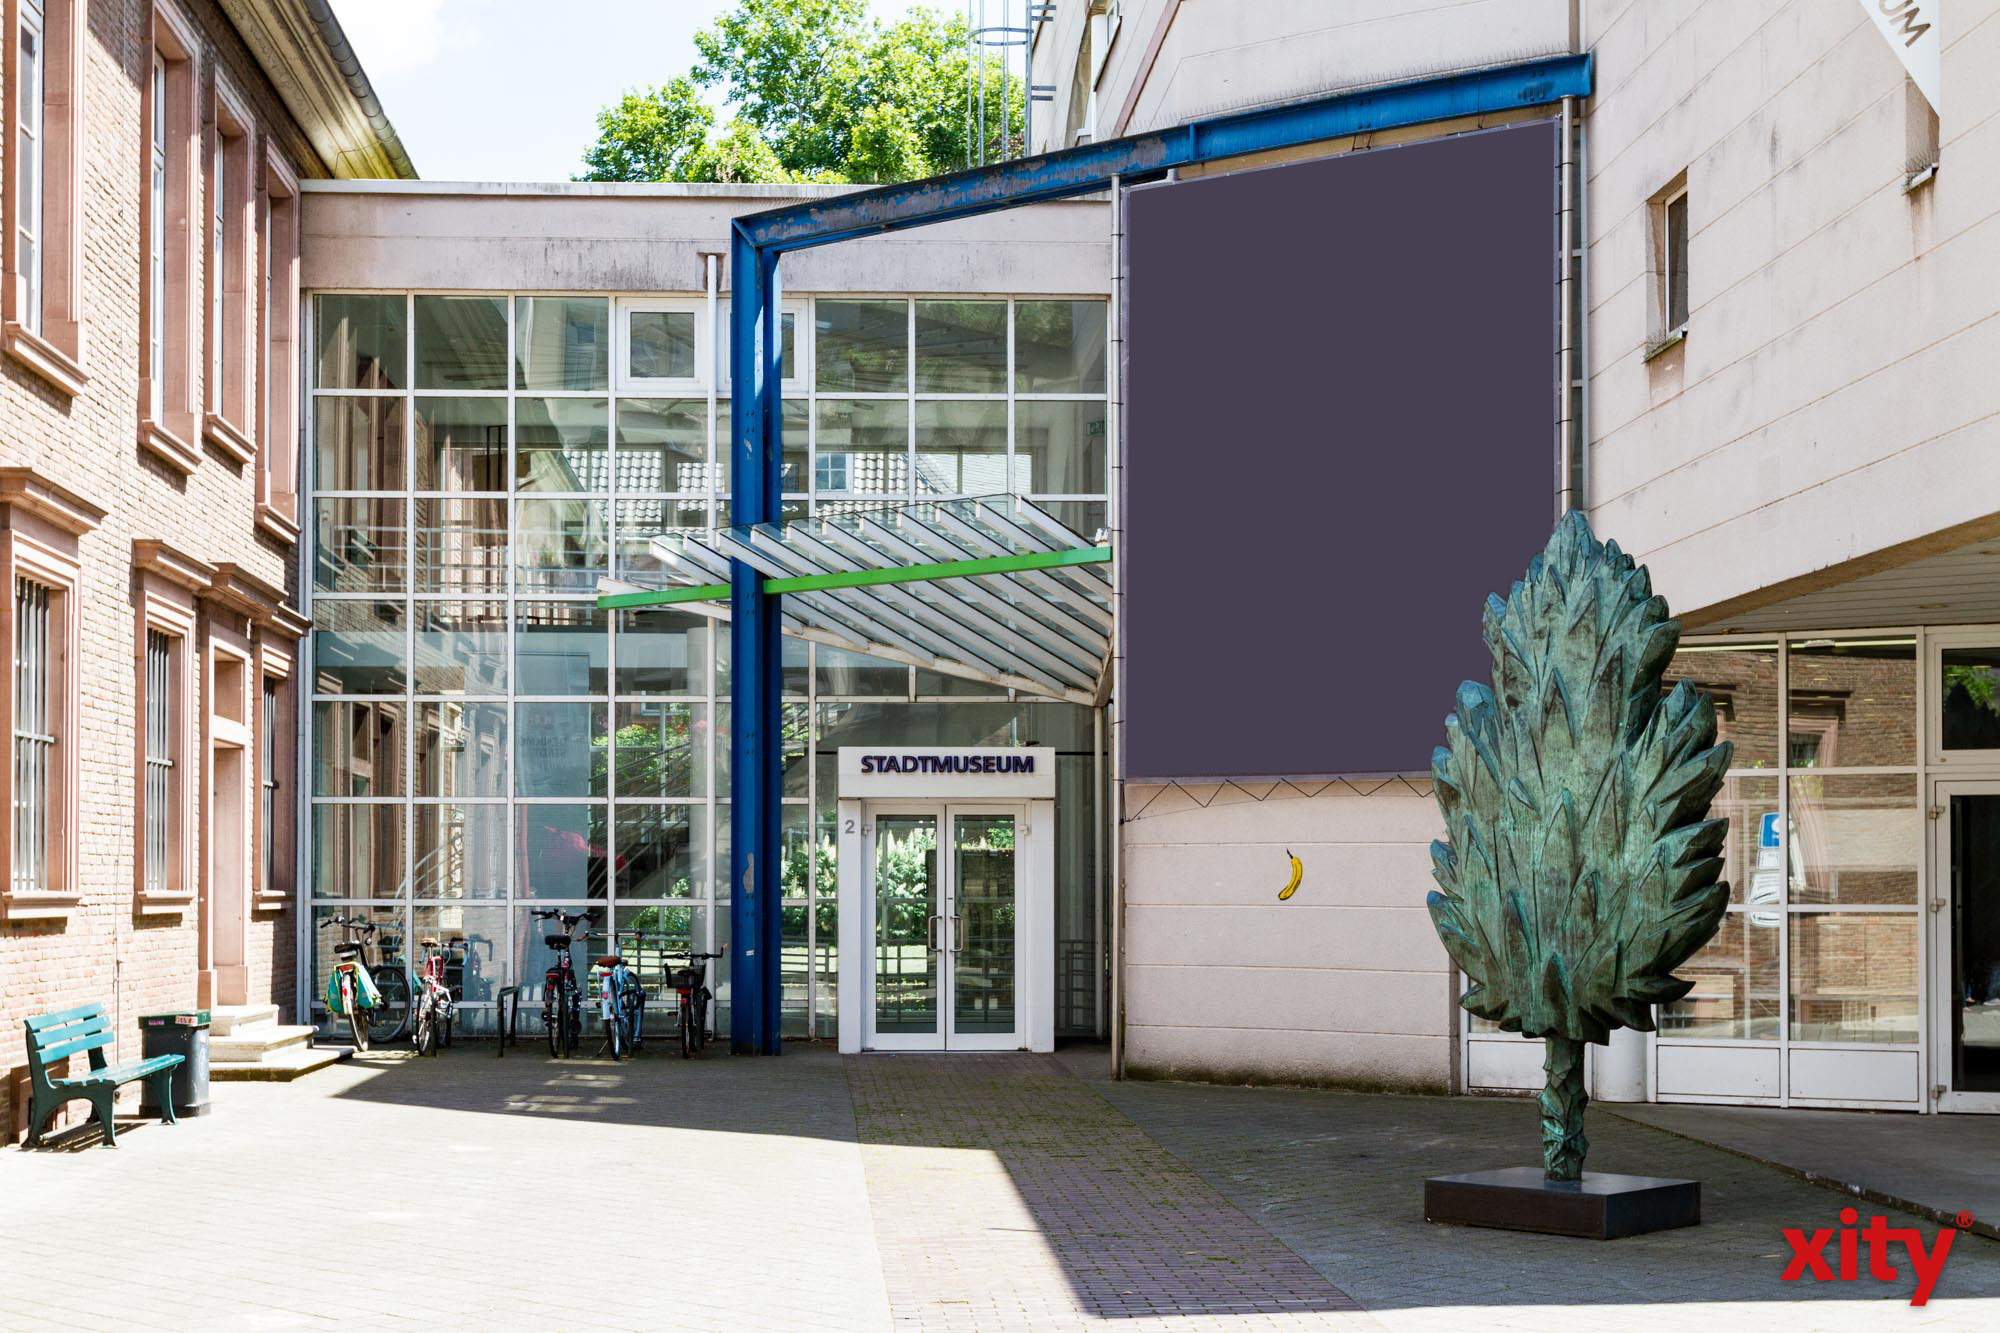 Ausstellung zu Max Stern im Stadtmuseum Düsseldorf (Foto: xity)